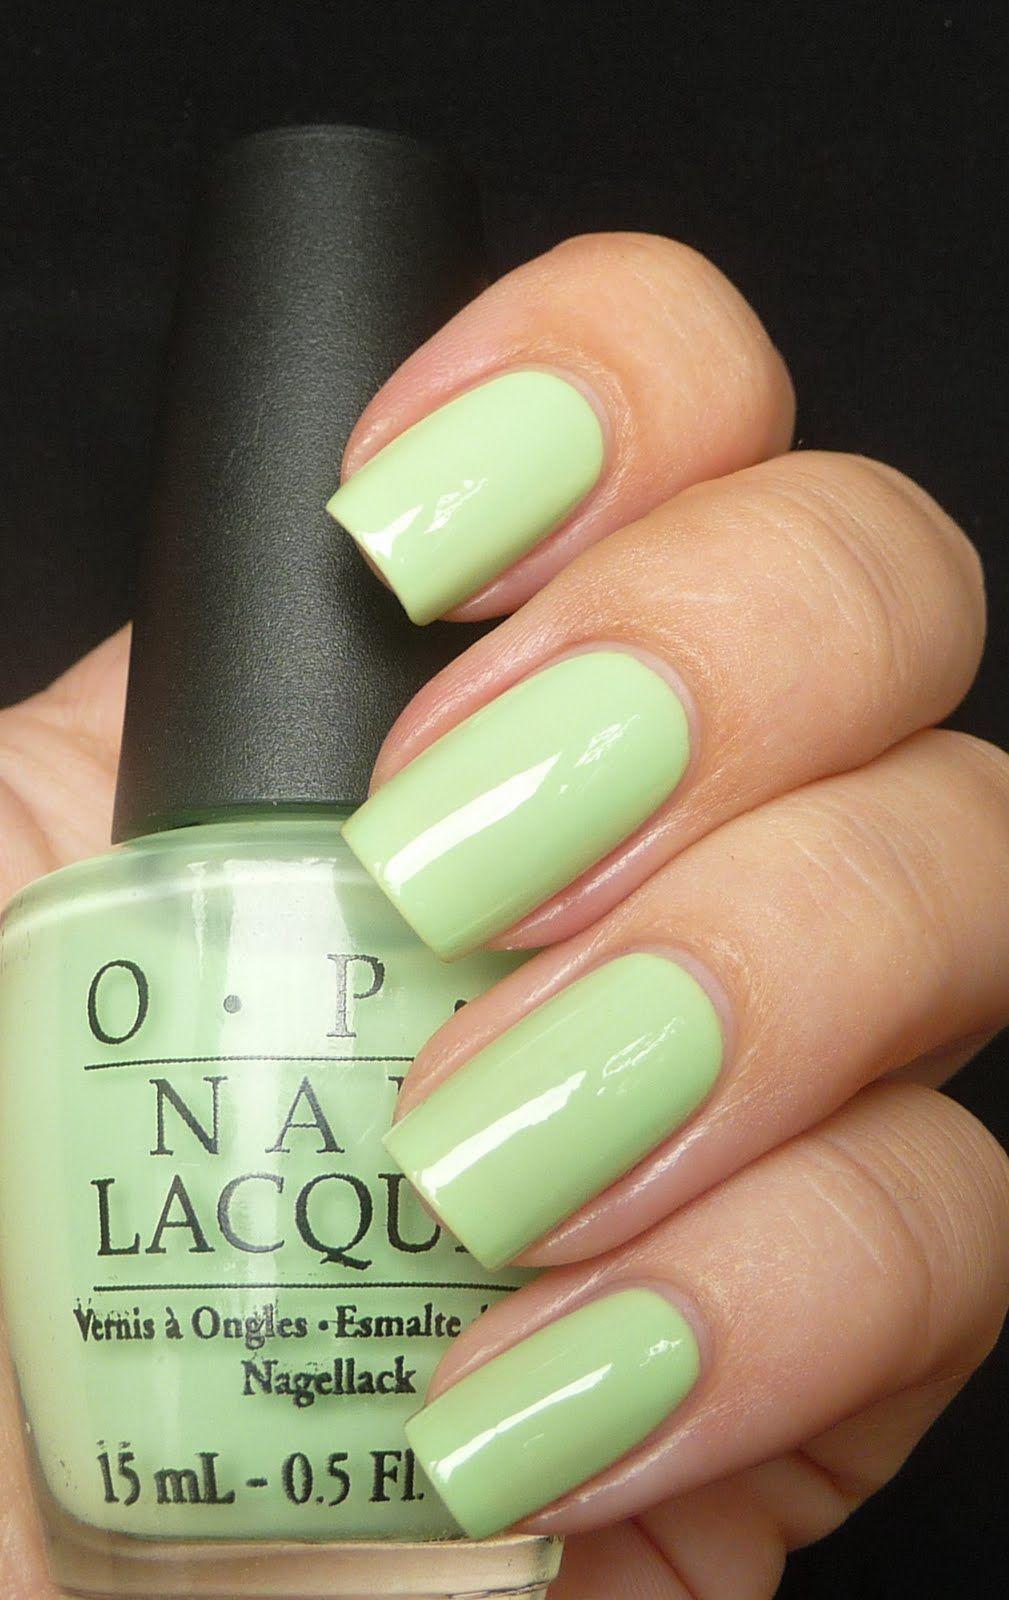 Currently on my nails: OPI Gargantuan Green Grape. Kind of like ...